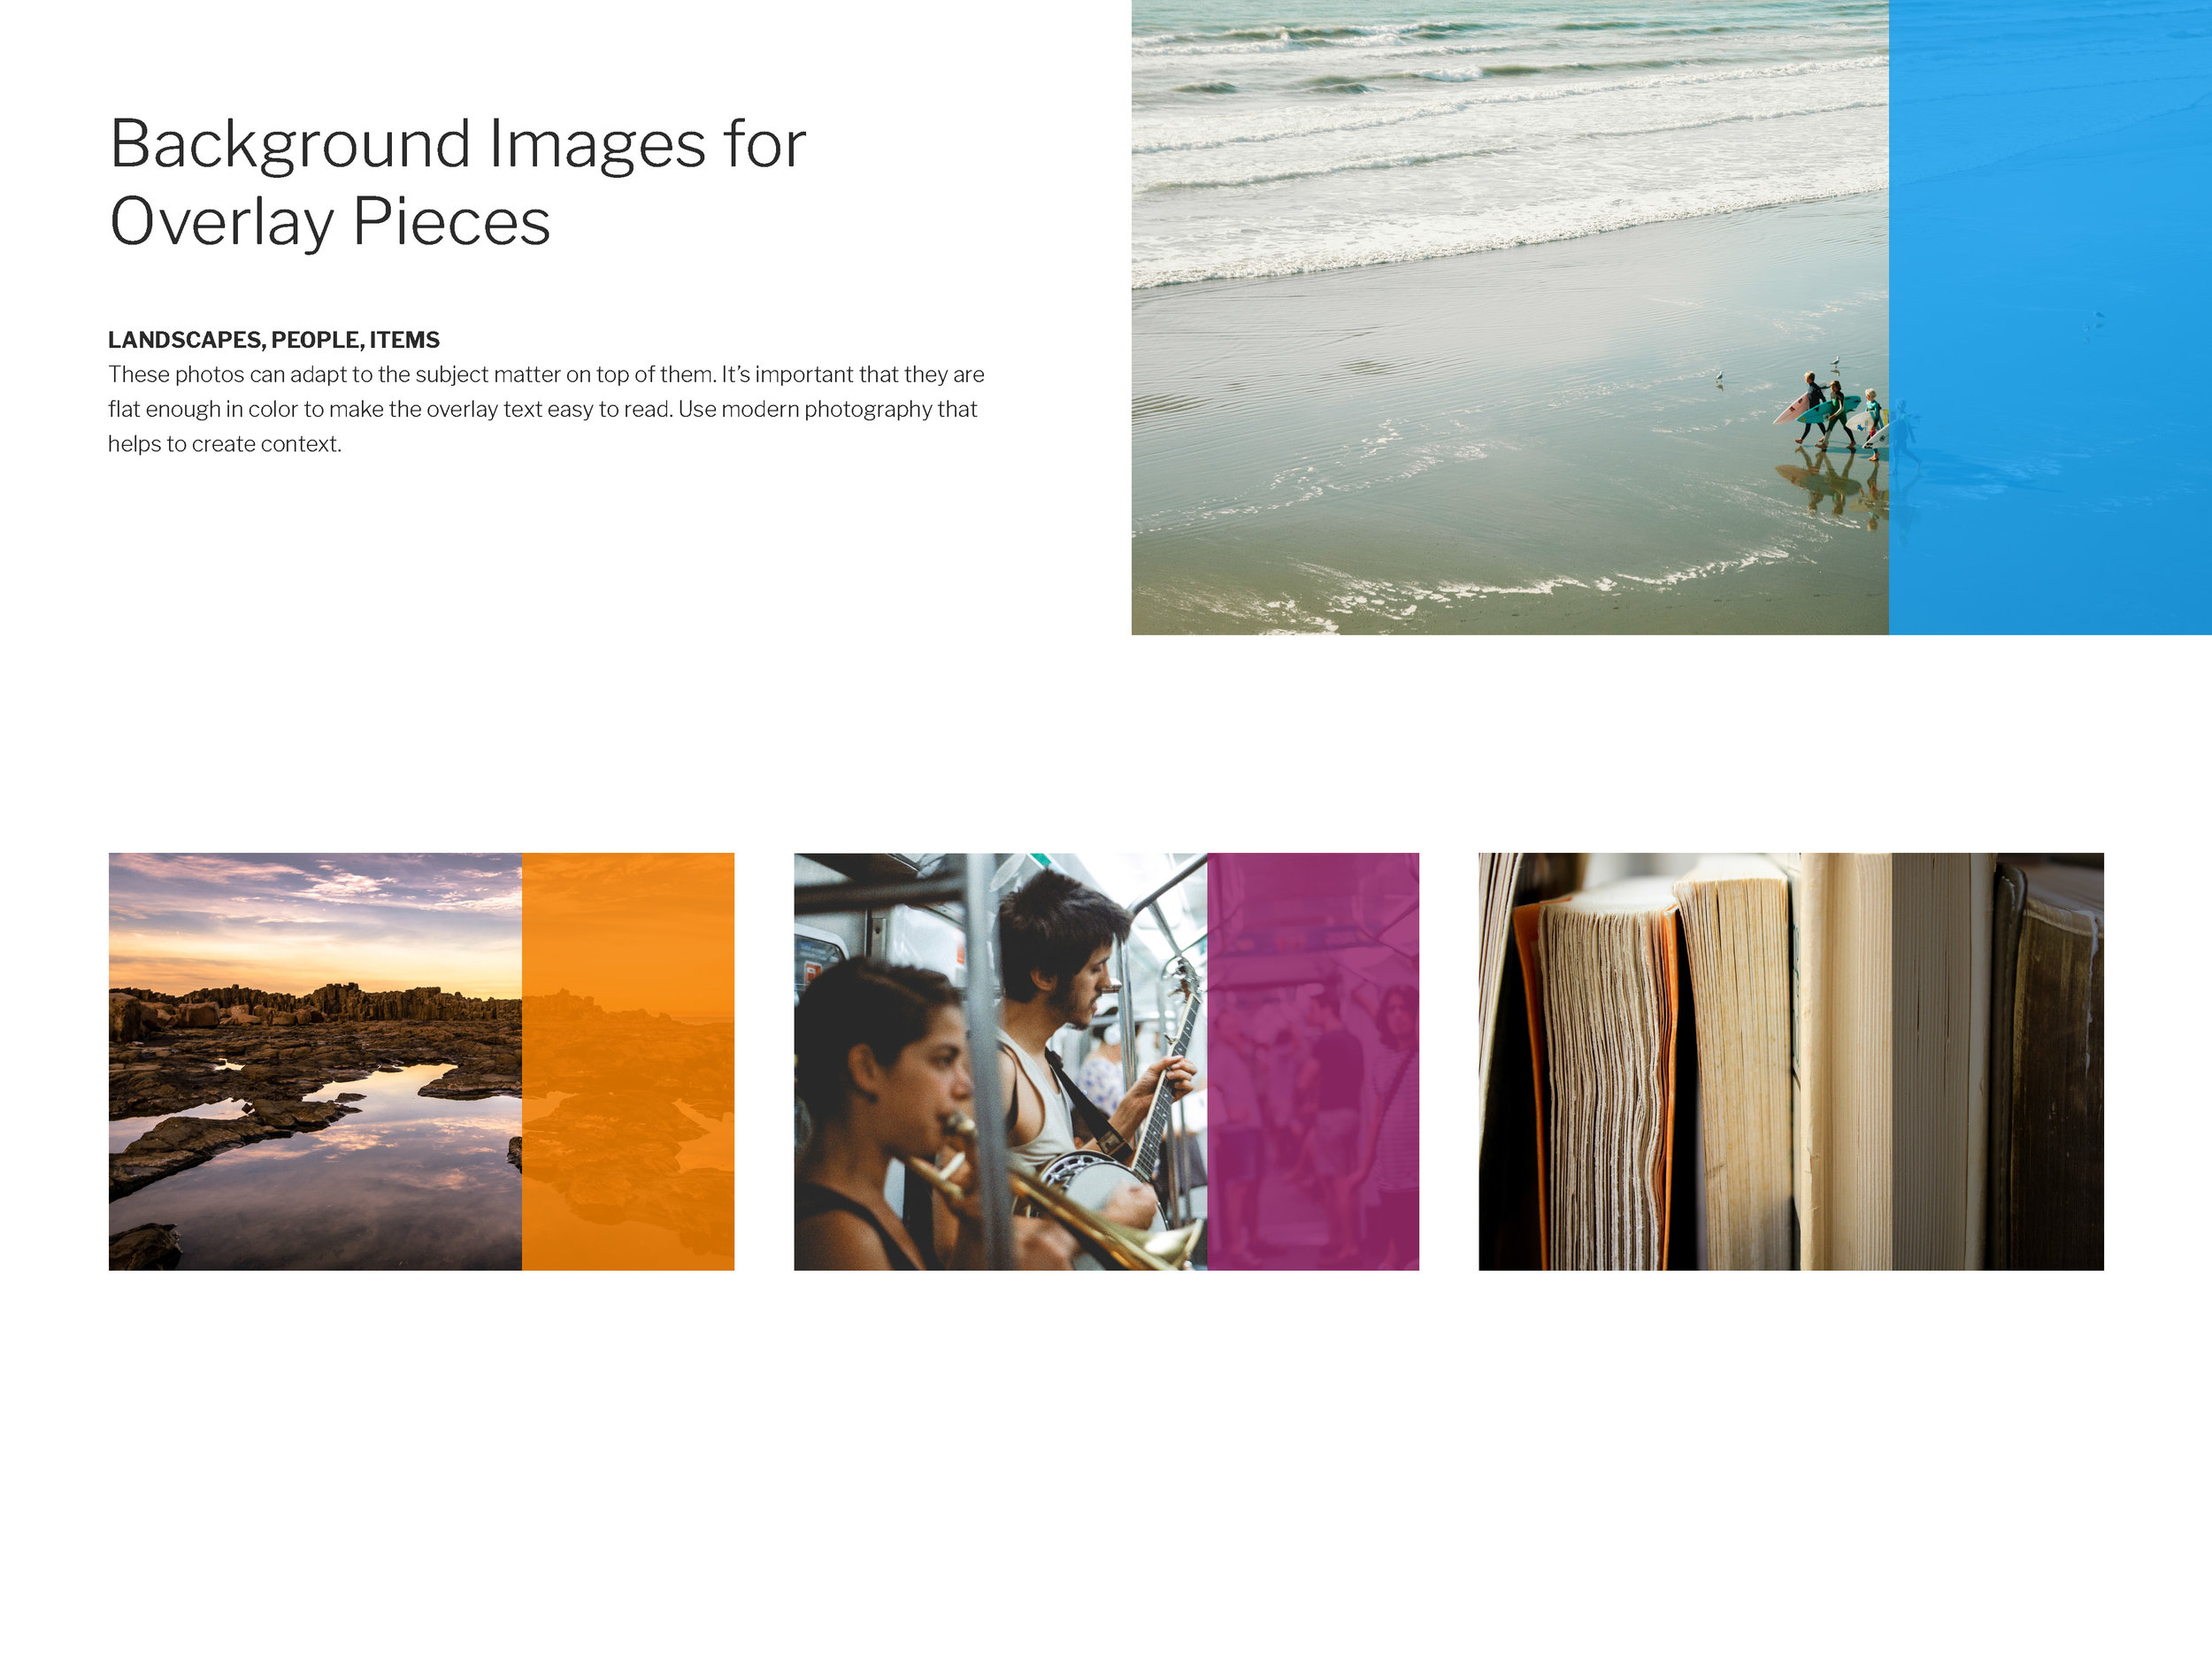 ciee_photobrandguide_Page_4.jpg